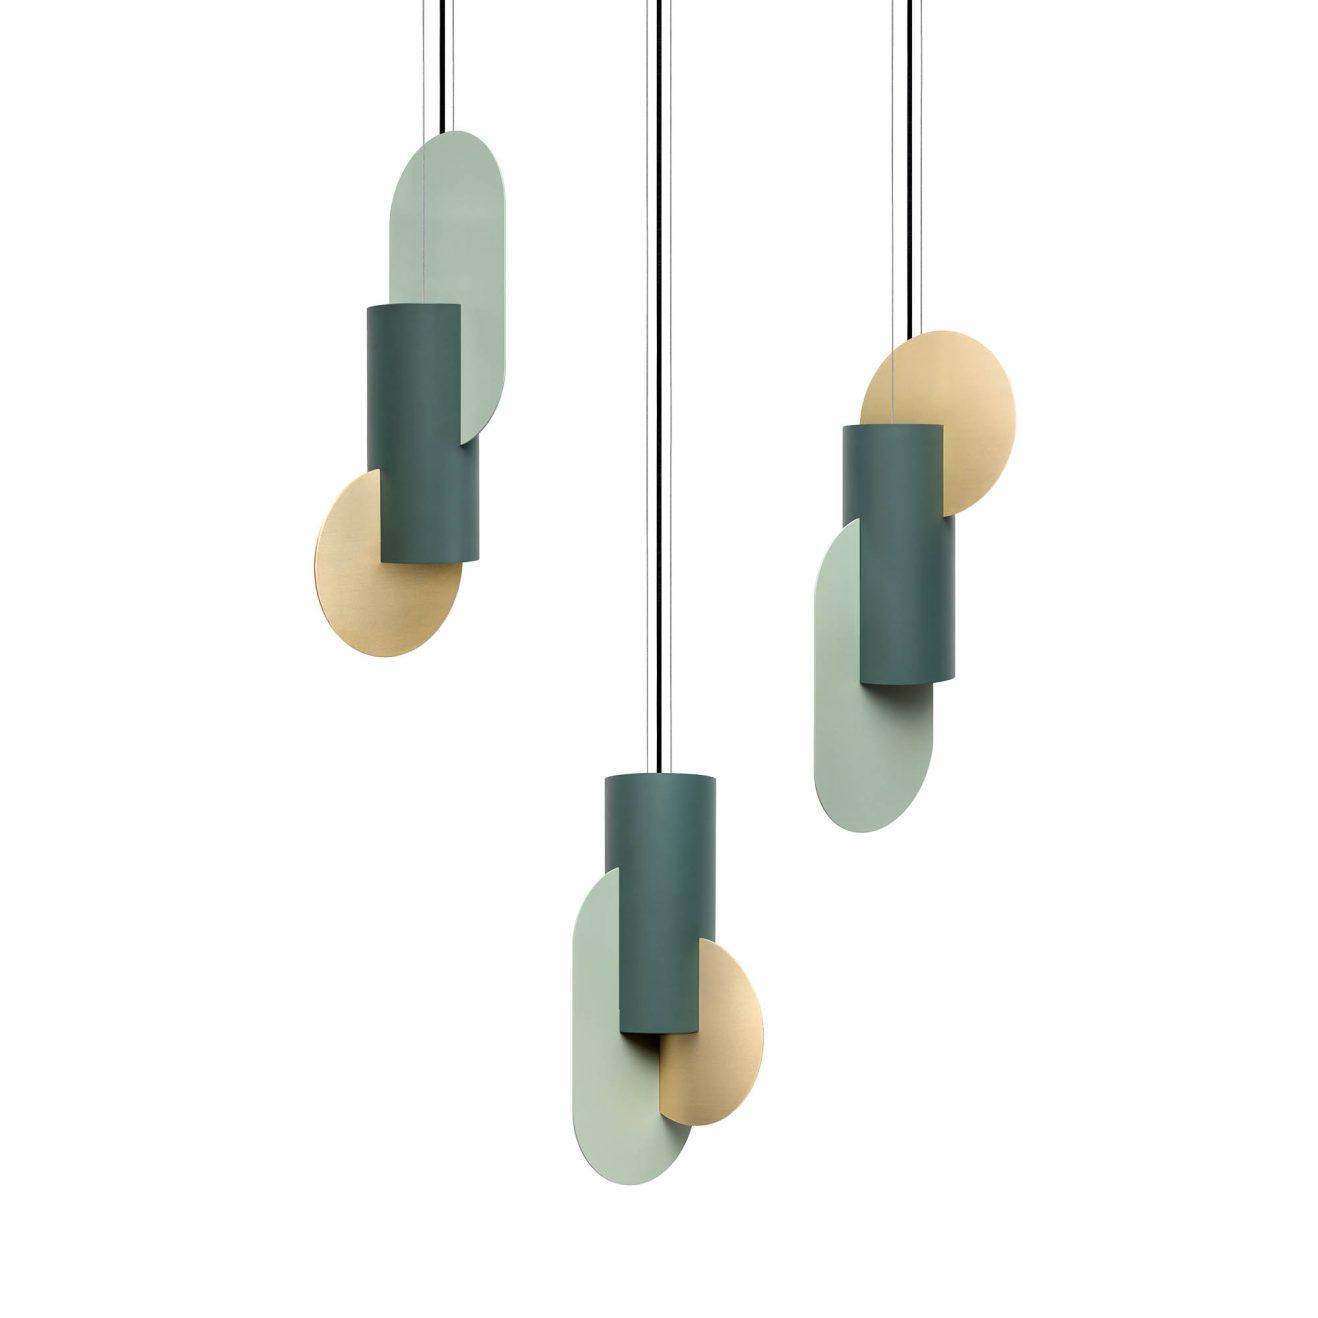 Noom-Suprematic-Lamp-CS5-5